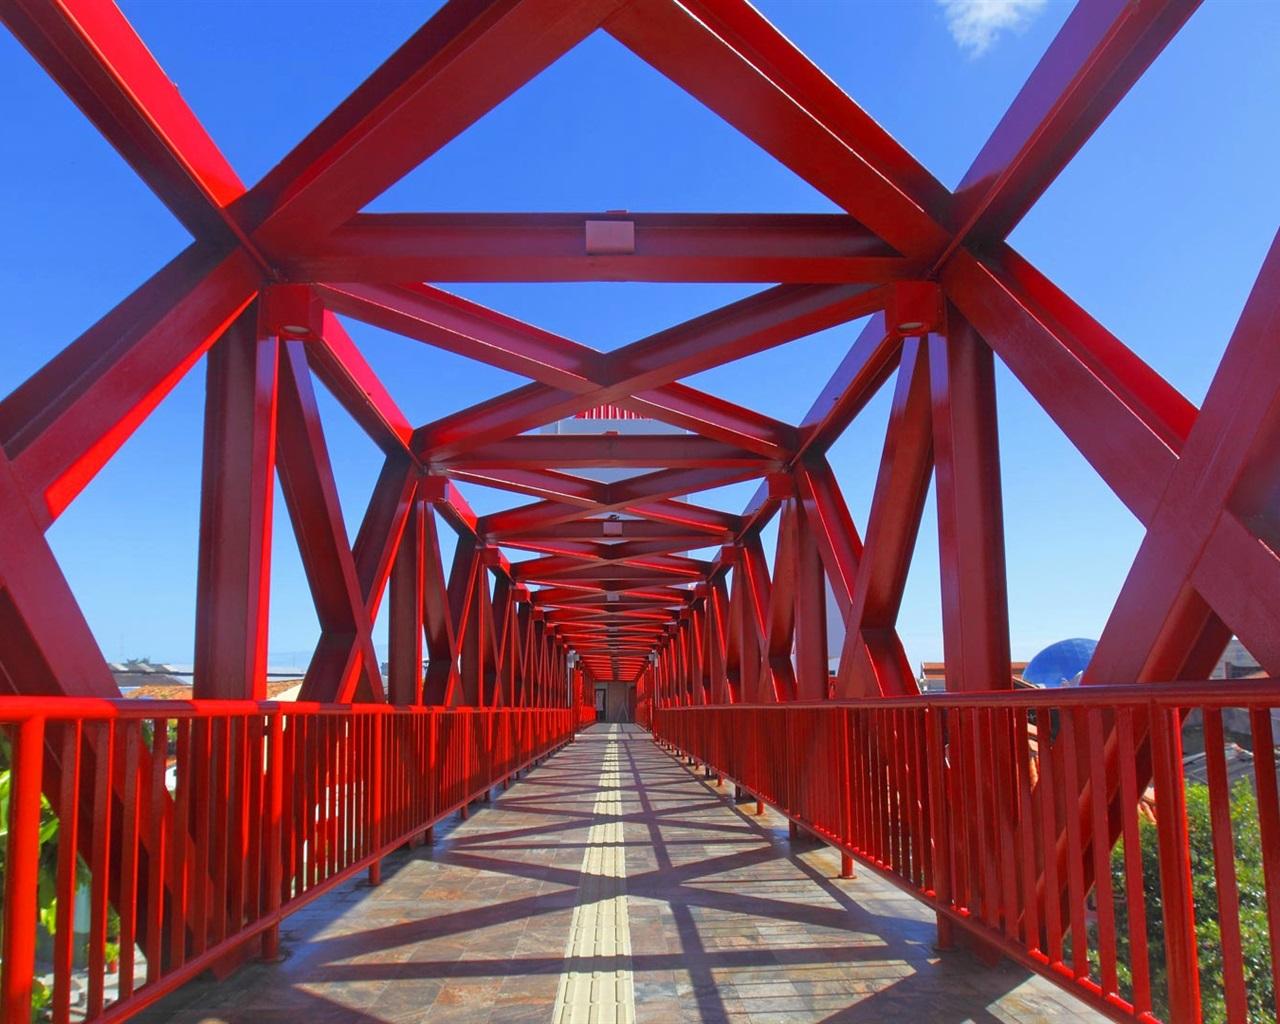 16 Luxury Pubg Wallpaper Iphone 6: 壁纸 巴西,福塔莱萨,桥梁,红色 1920x1080 Full HD 2K 高清壁纸, 图片, 照片